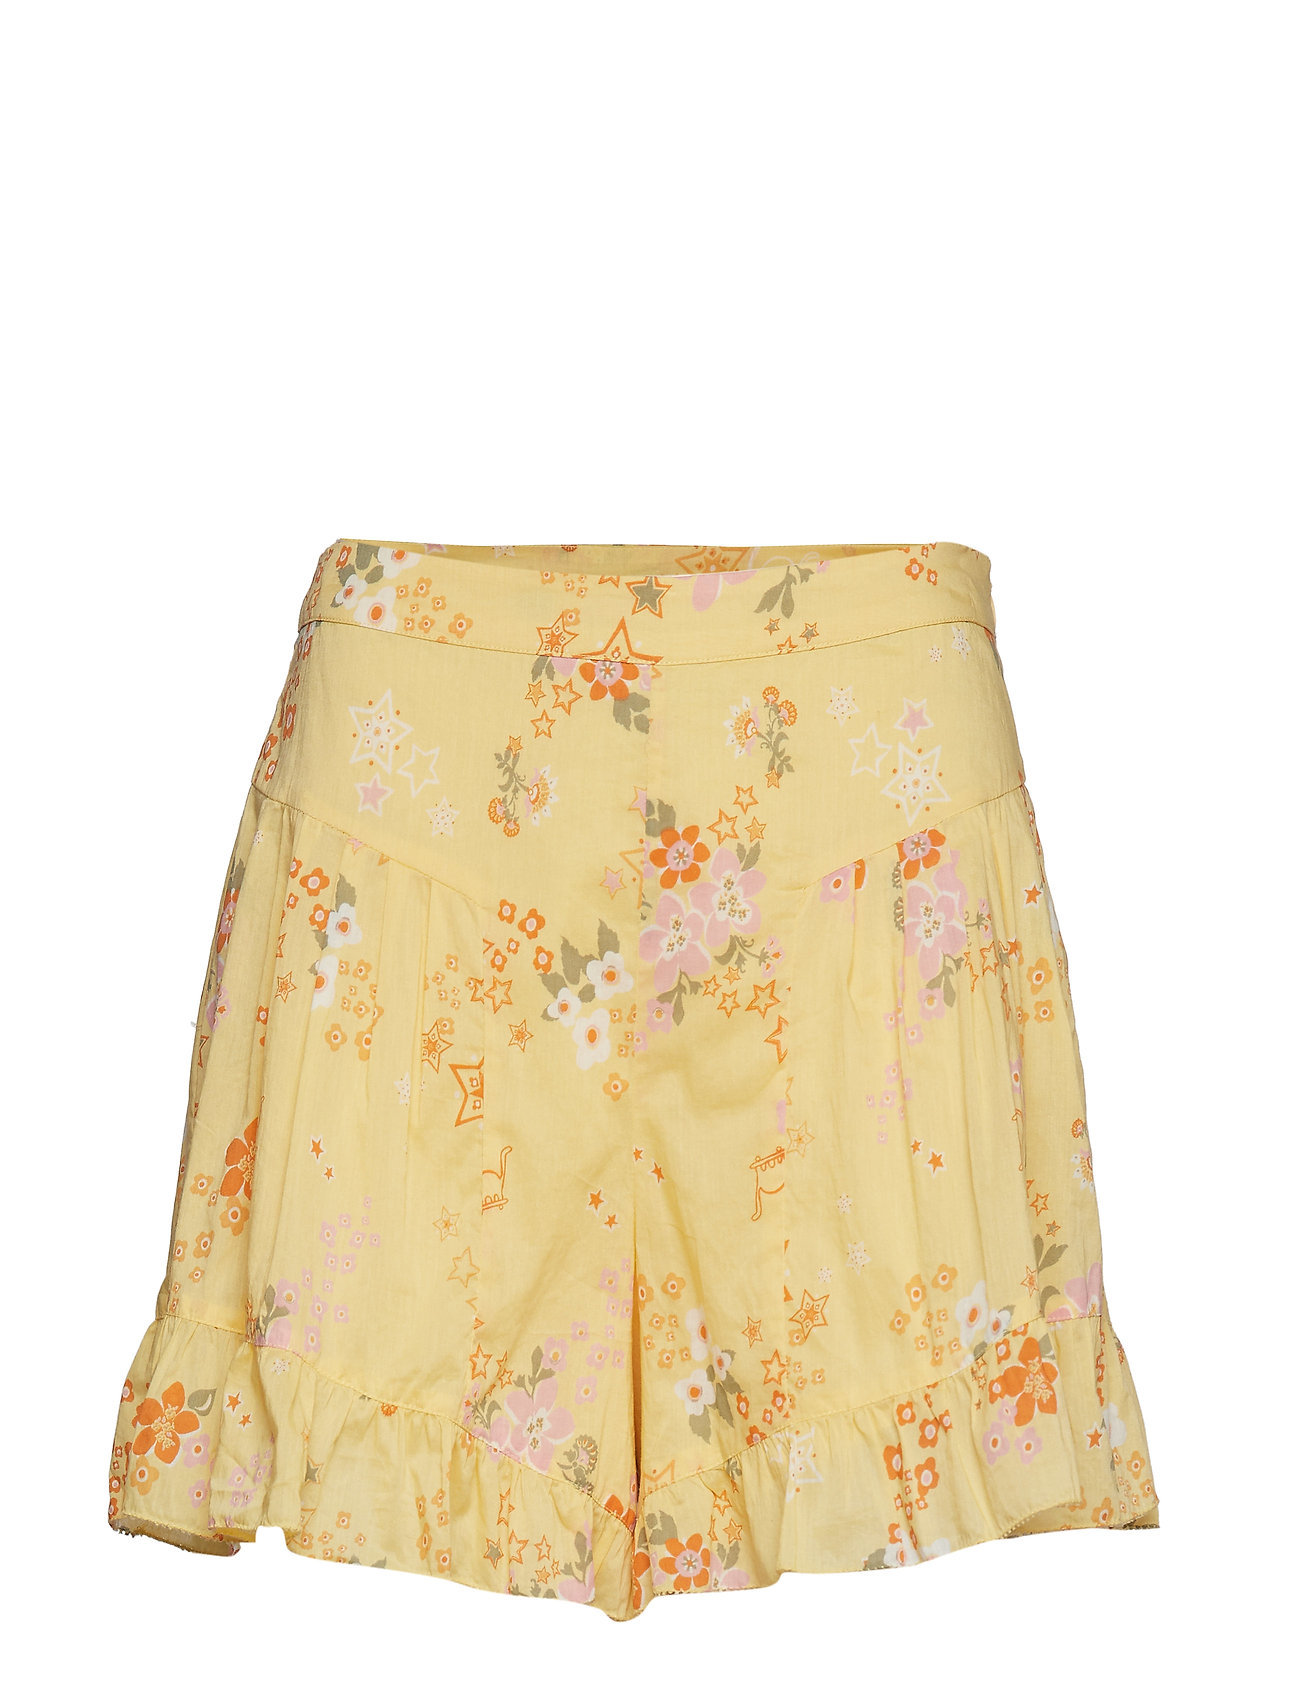 Free Free Molly YellowOdd Shortsvintage Shortsvintage YellowOdd Marvelously Free Marvelously Molly Marvelously Shortsvintage YellowOdd eDHWbIYE29